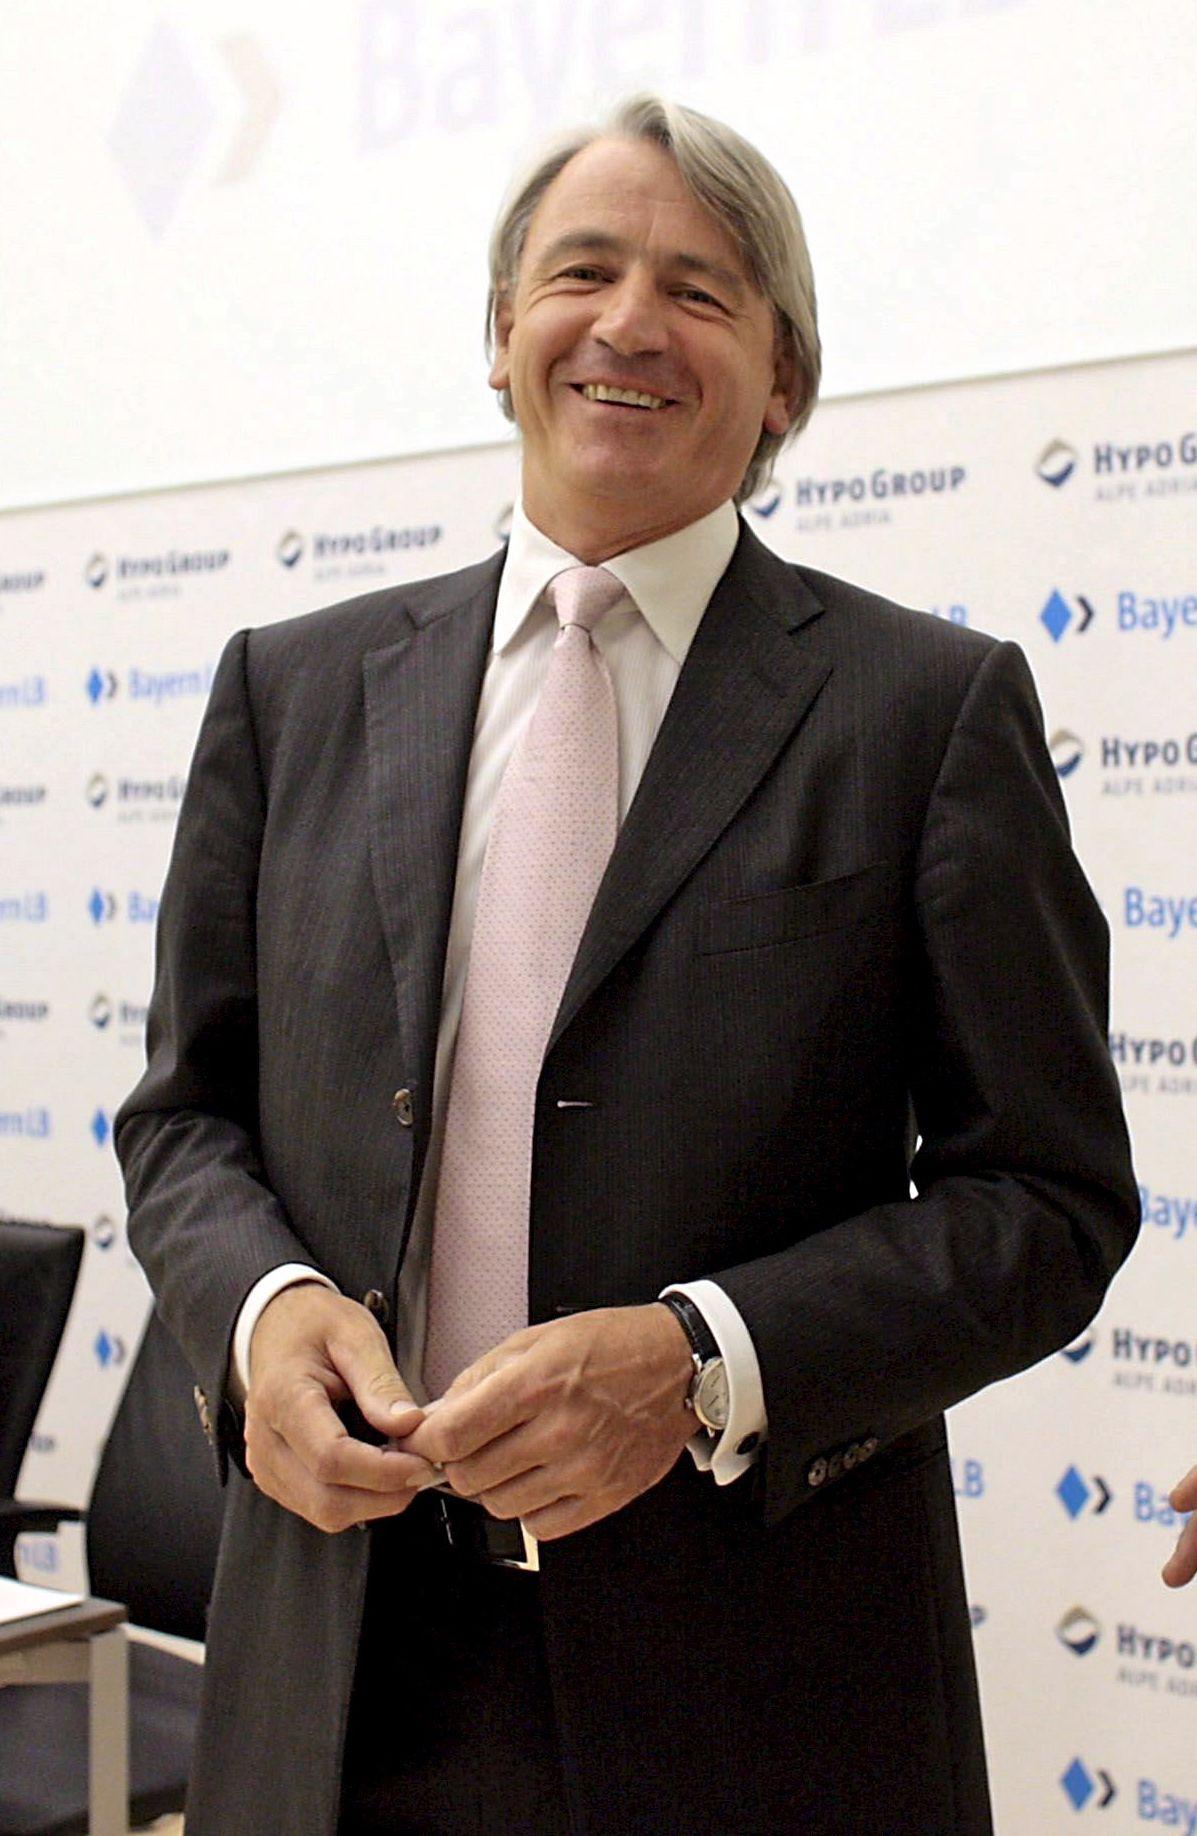 Ex-Bankenchef Kulterer in Österreich festgenommen